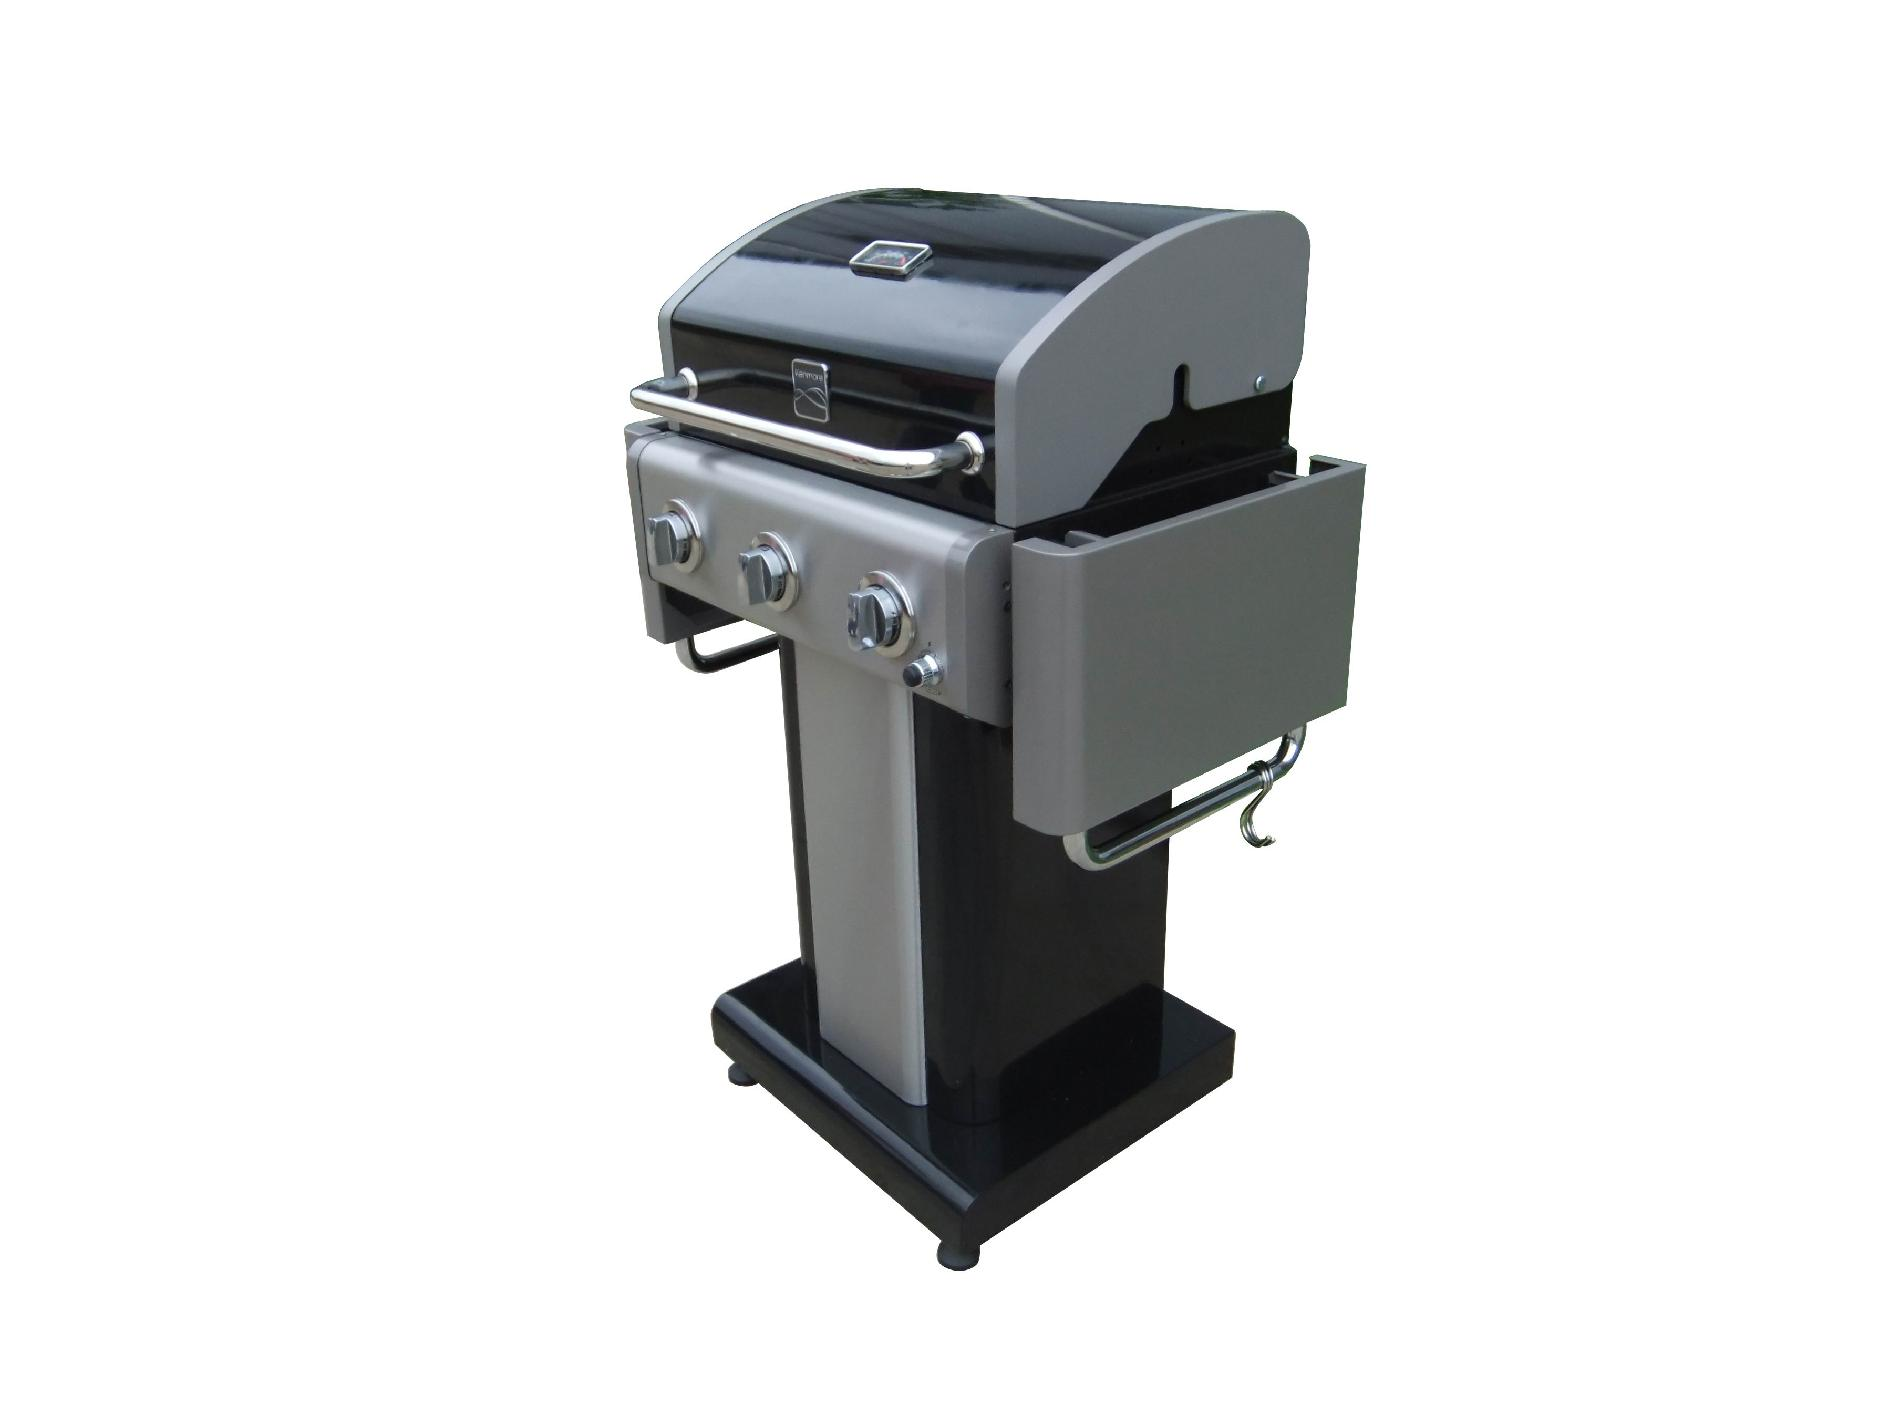 Kenmore 3 Burner Patio Grill